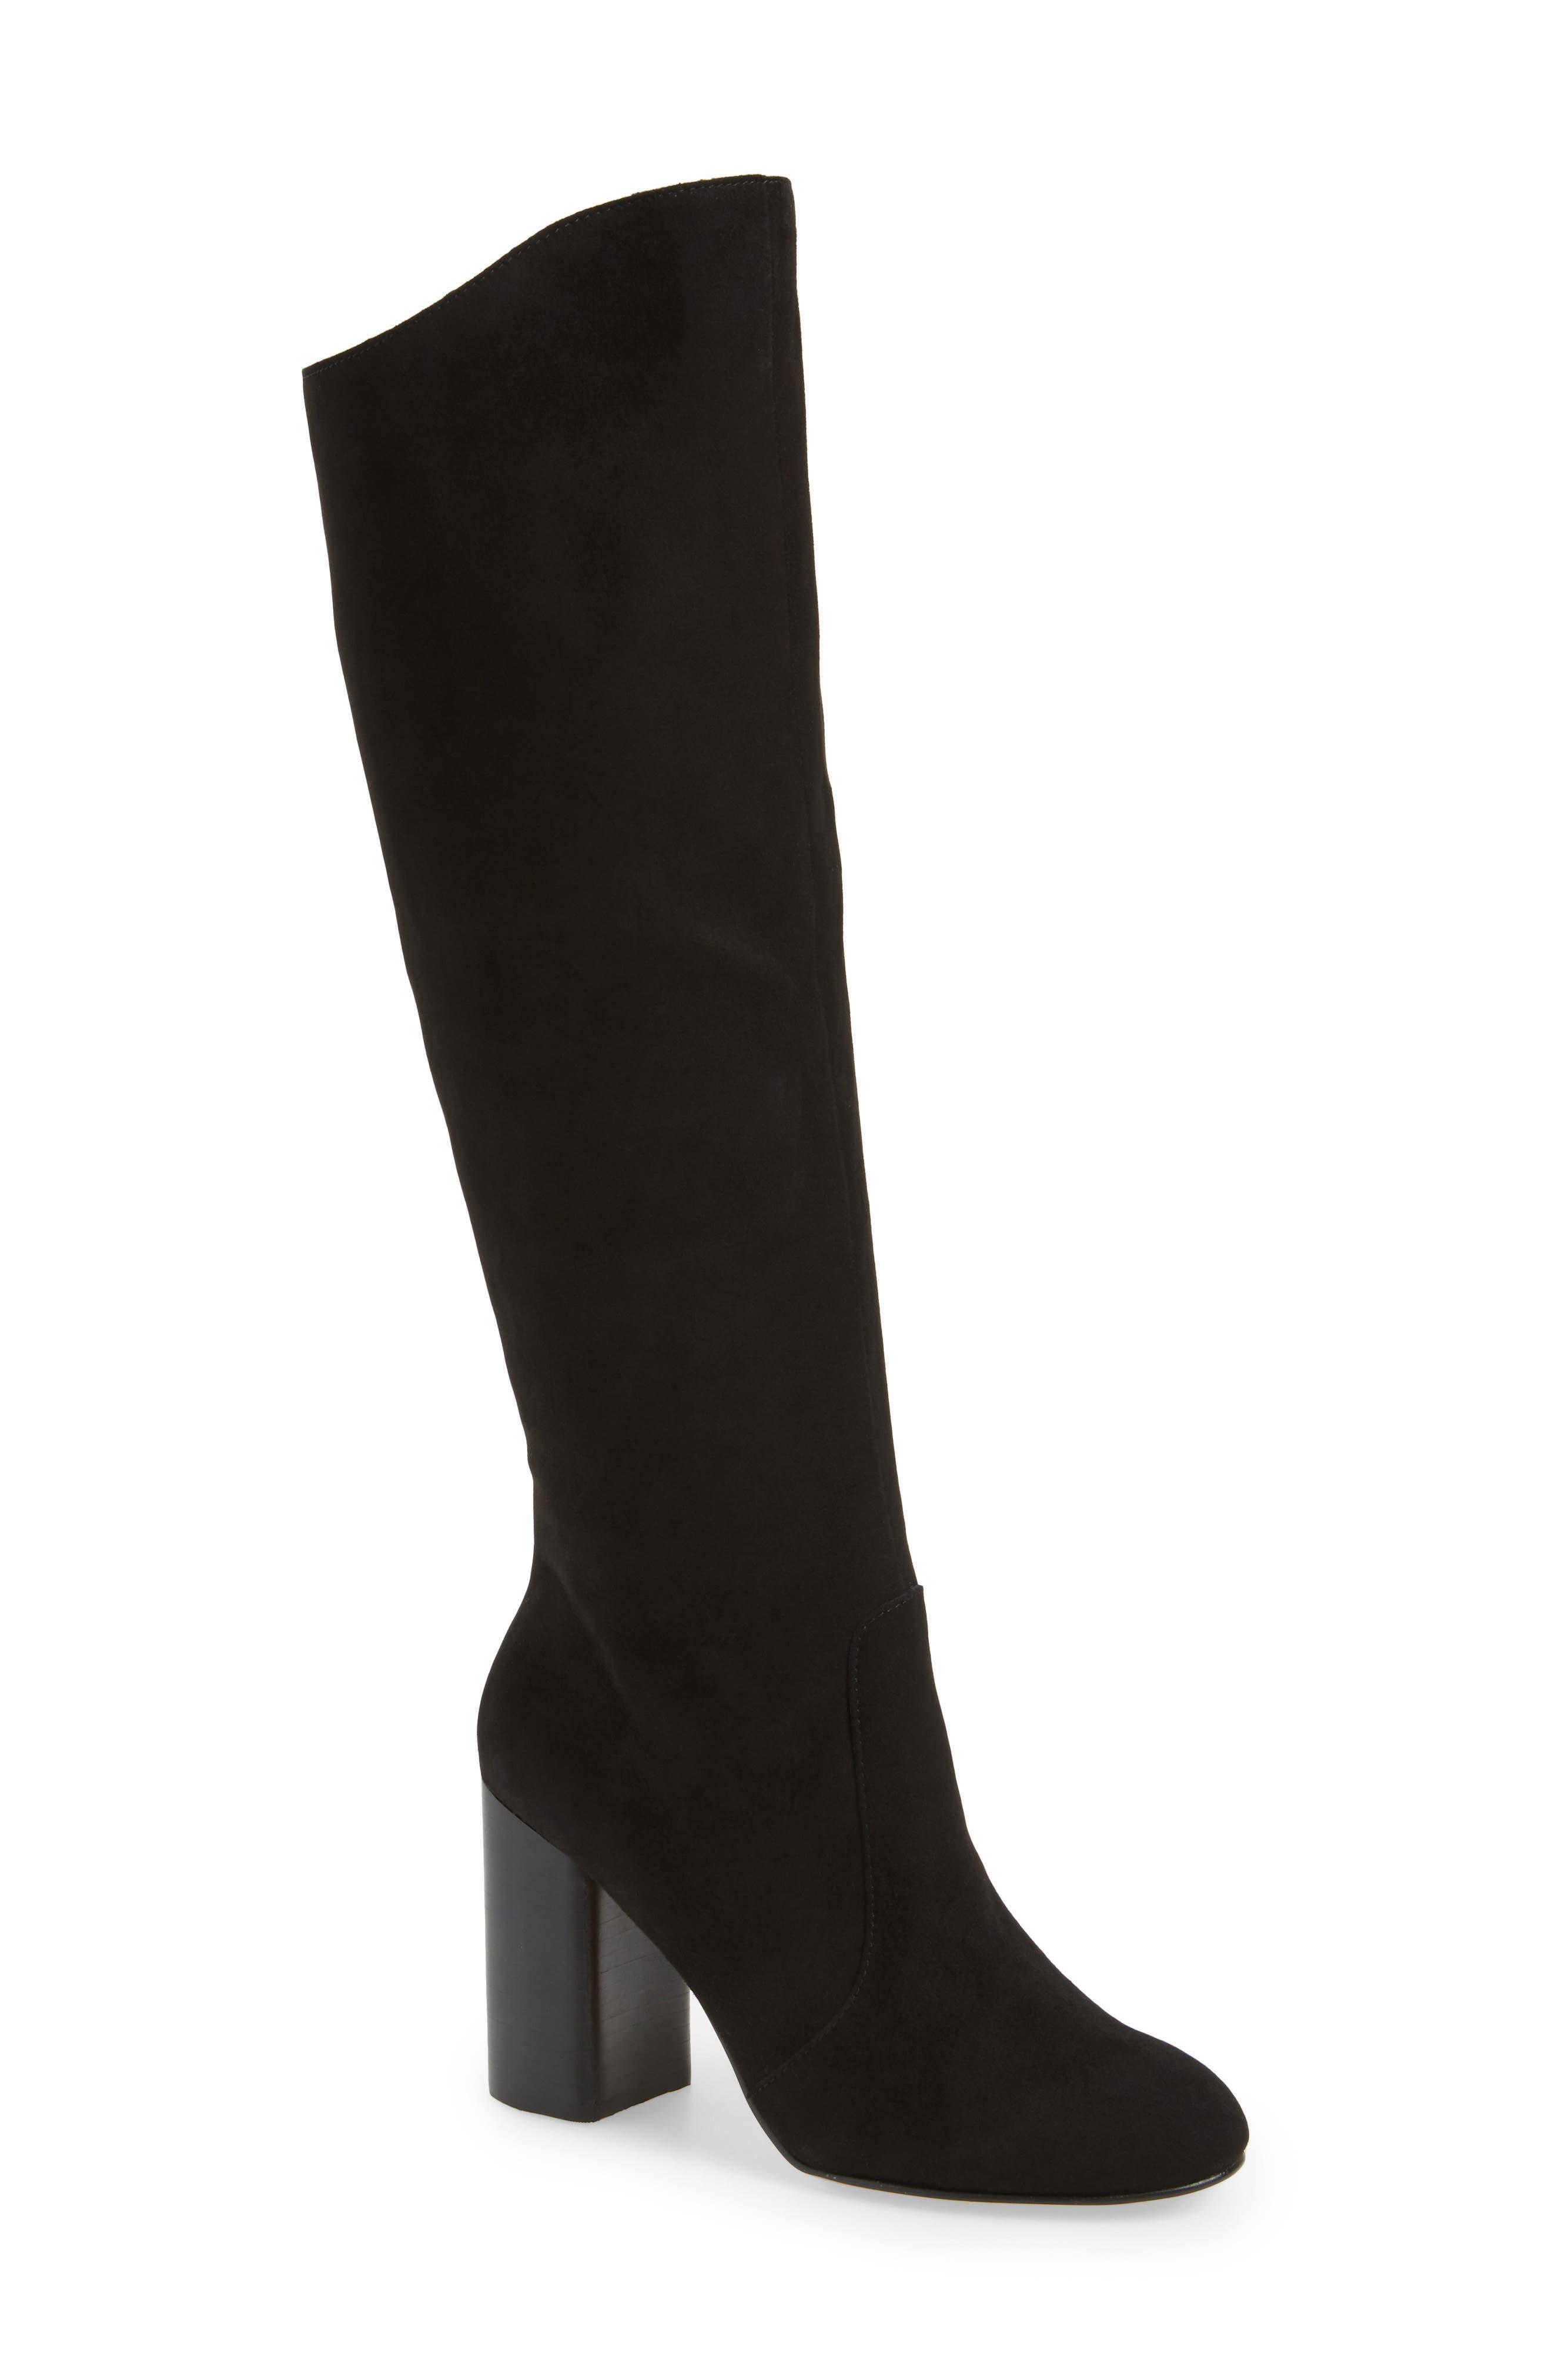 Main Image - Dolce Vita Rhea Knee High Boot (Women)